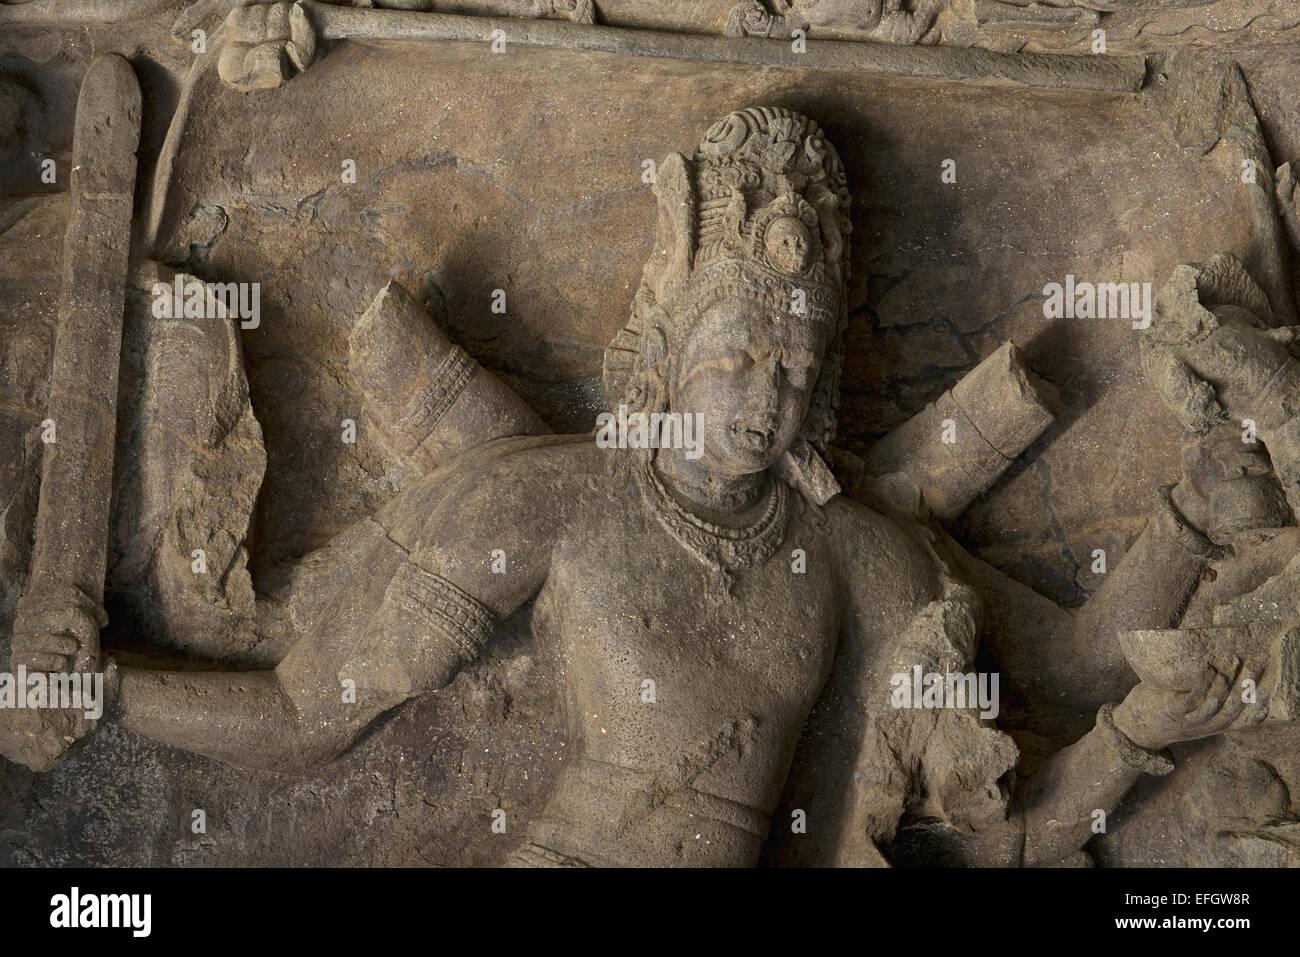 La cueva 1-vadha Andhakasura-murti. Acercar la vista elefanta Cuevas, Mumbai, India Imagen De Stock